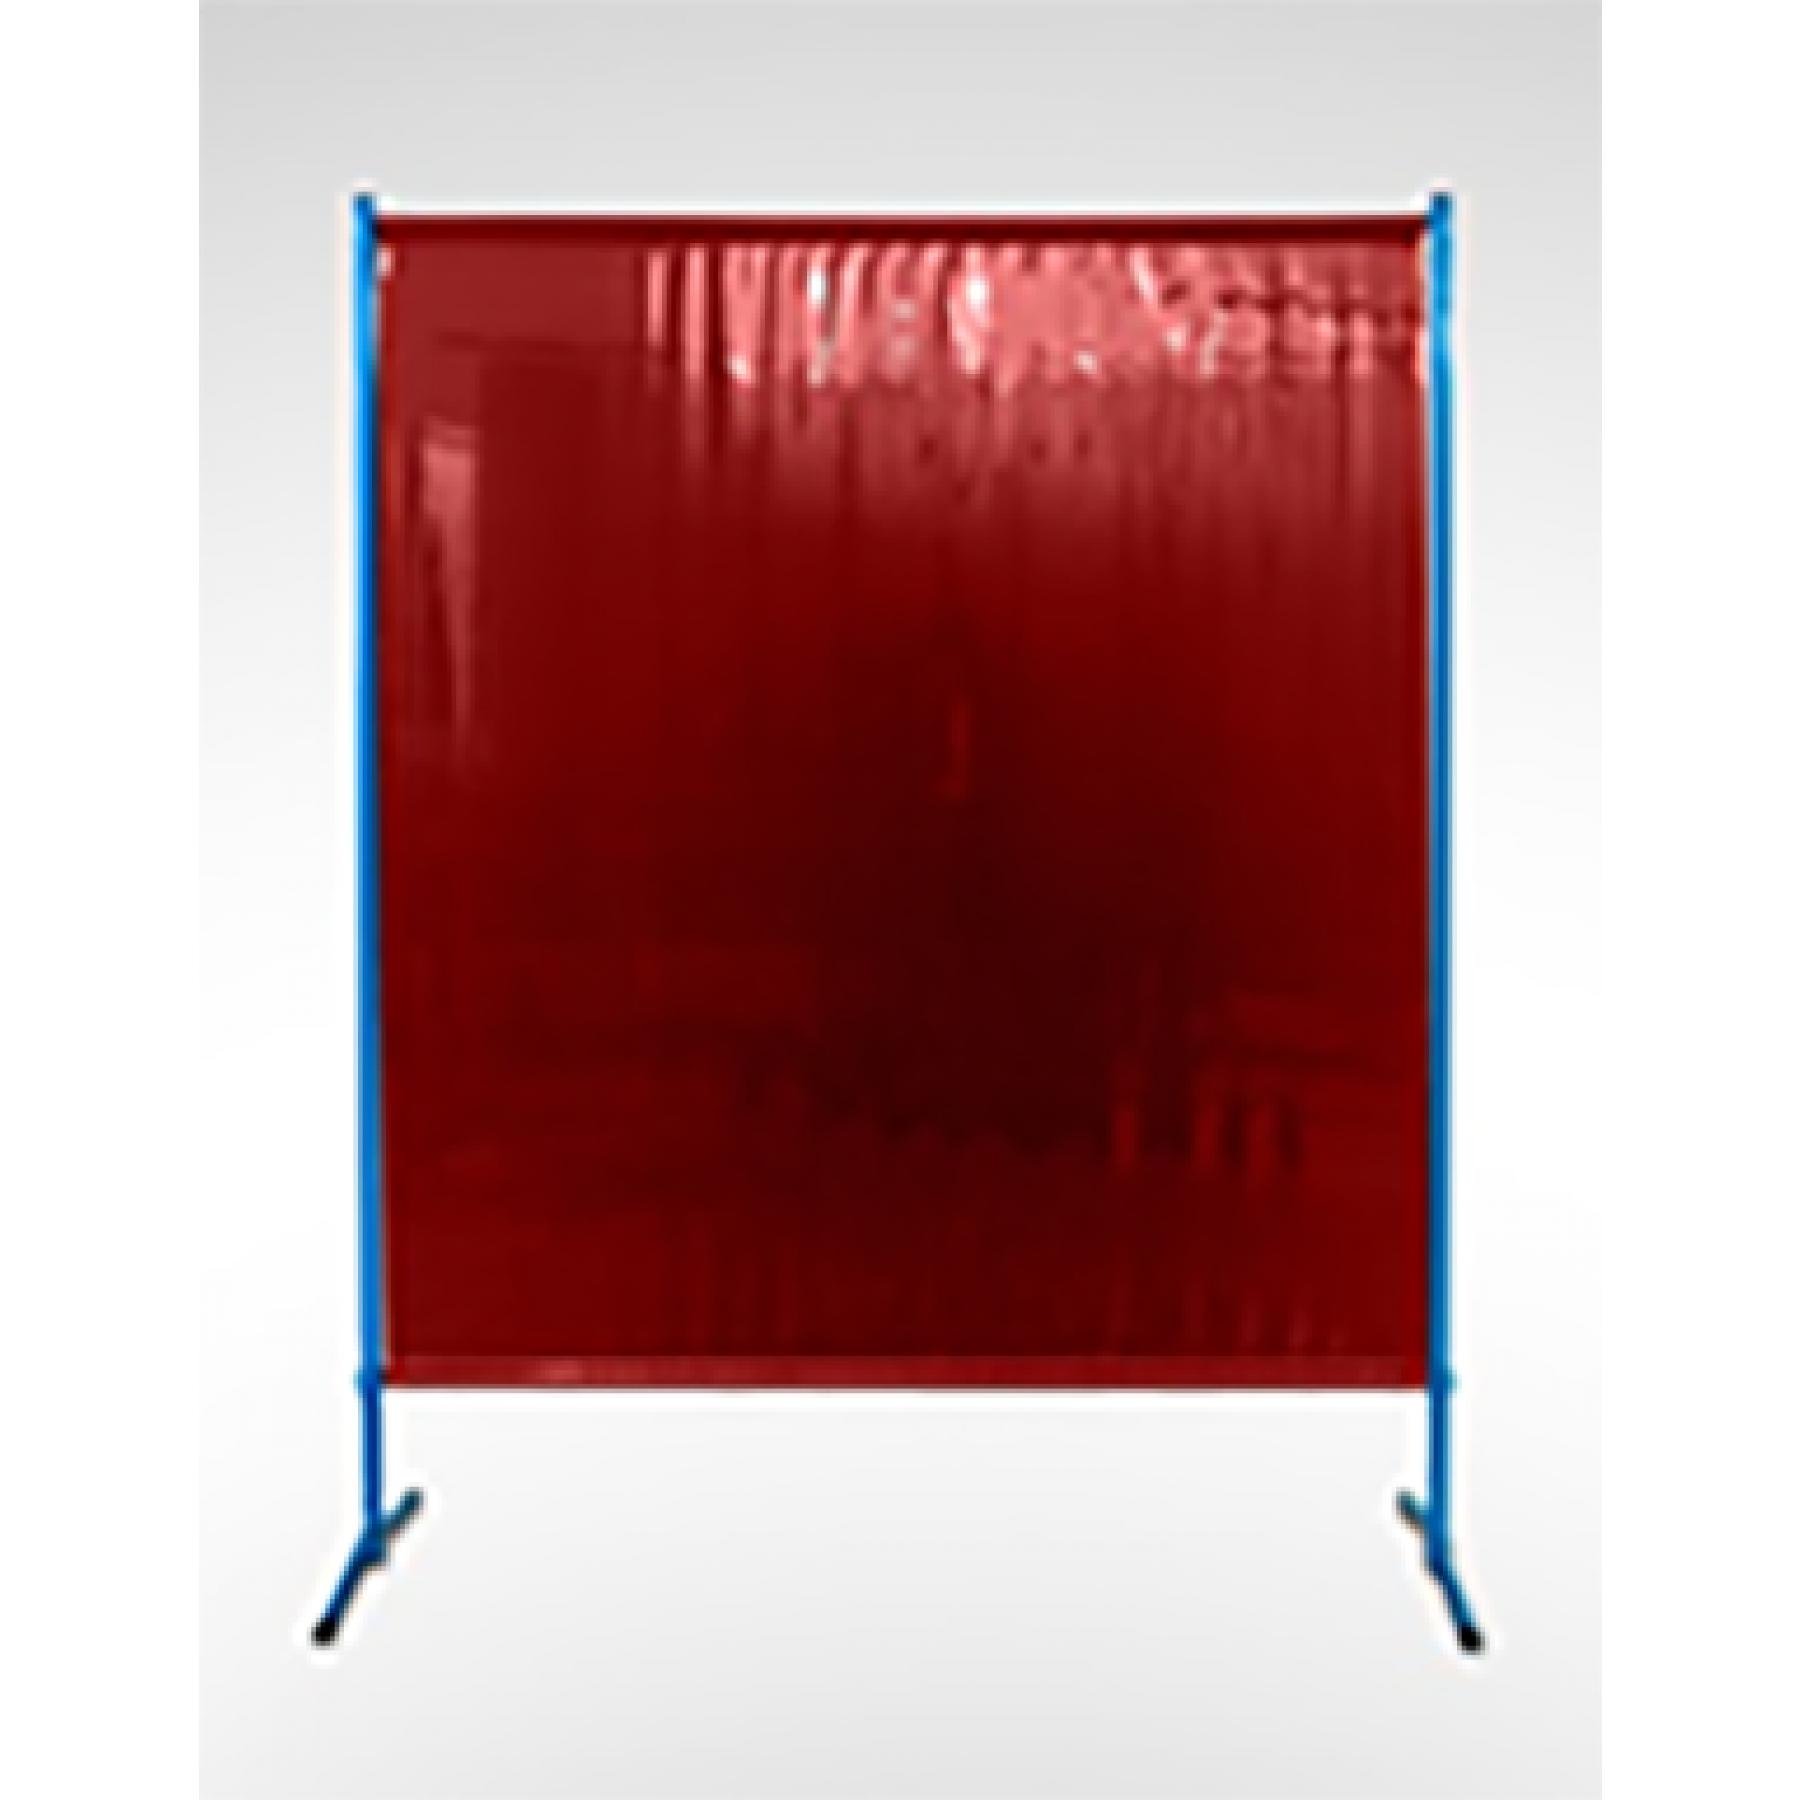 Lasscherm ECO, 1455 x 1870 mm (breedte x hoogte), 0.4 mm sheet, rood